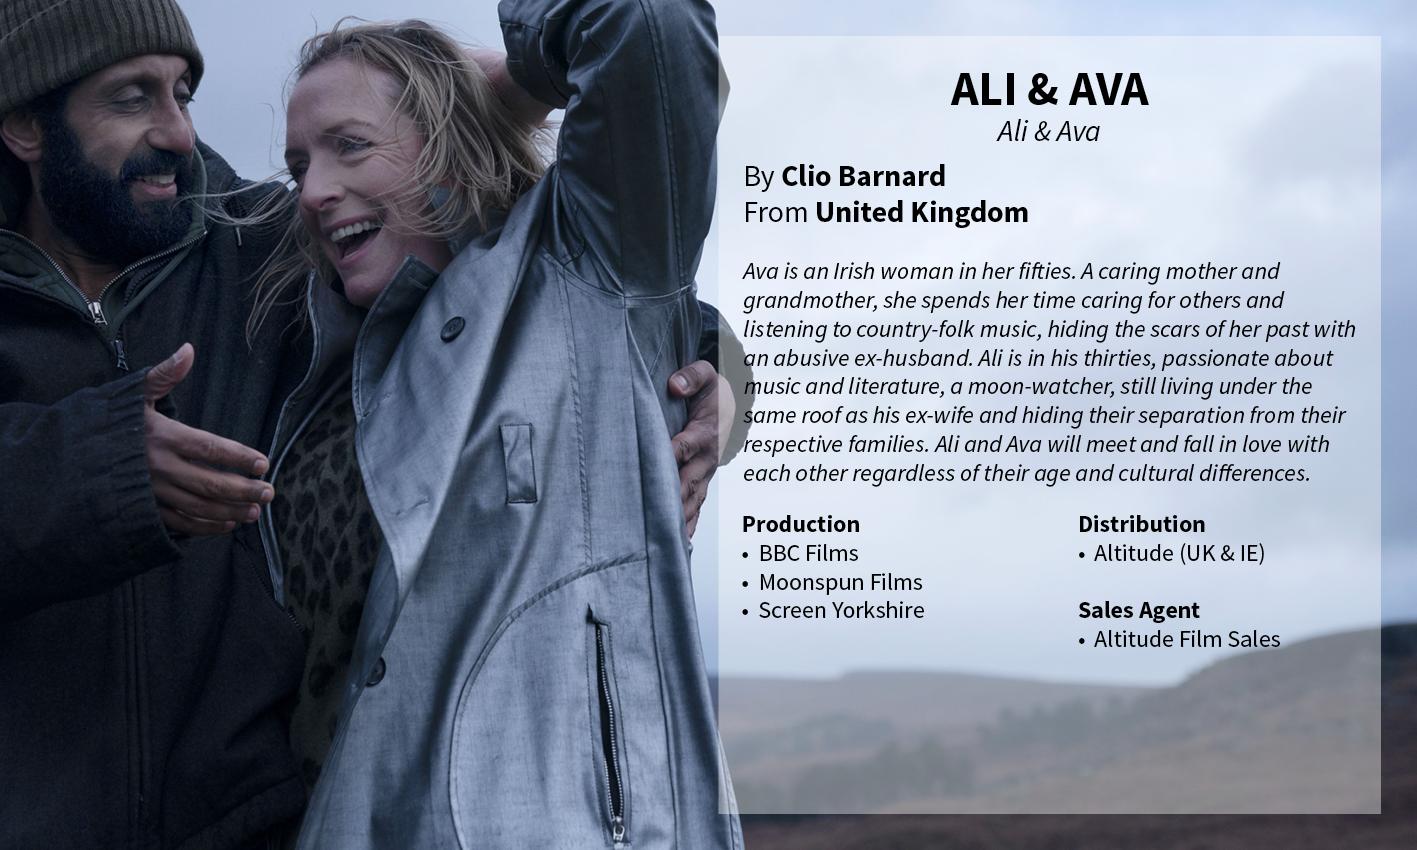 Ali & Ava Clio Barnard